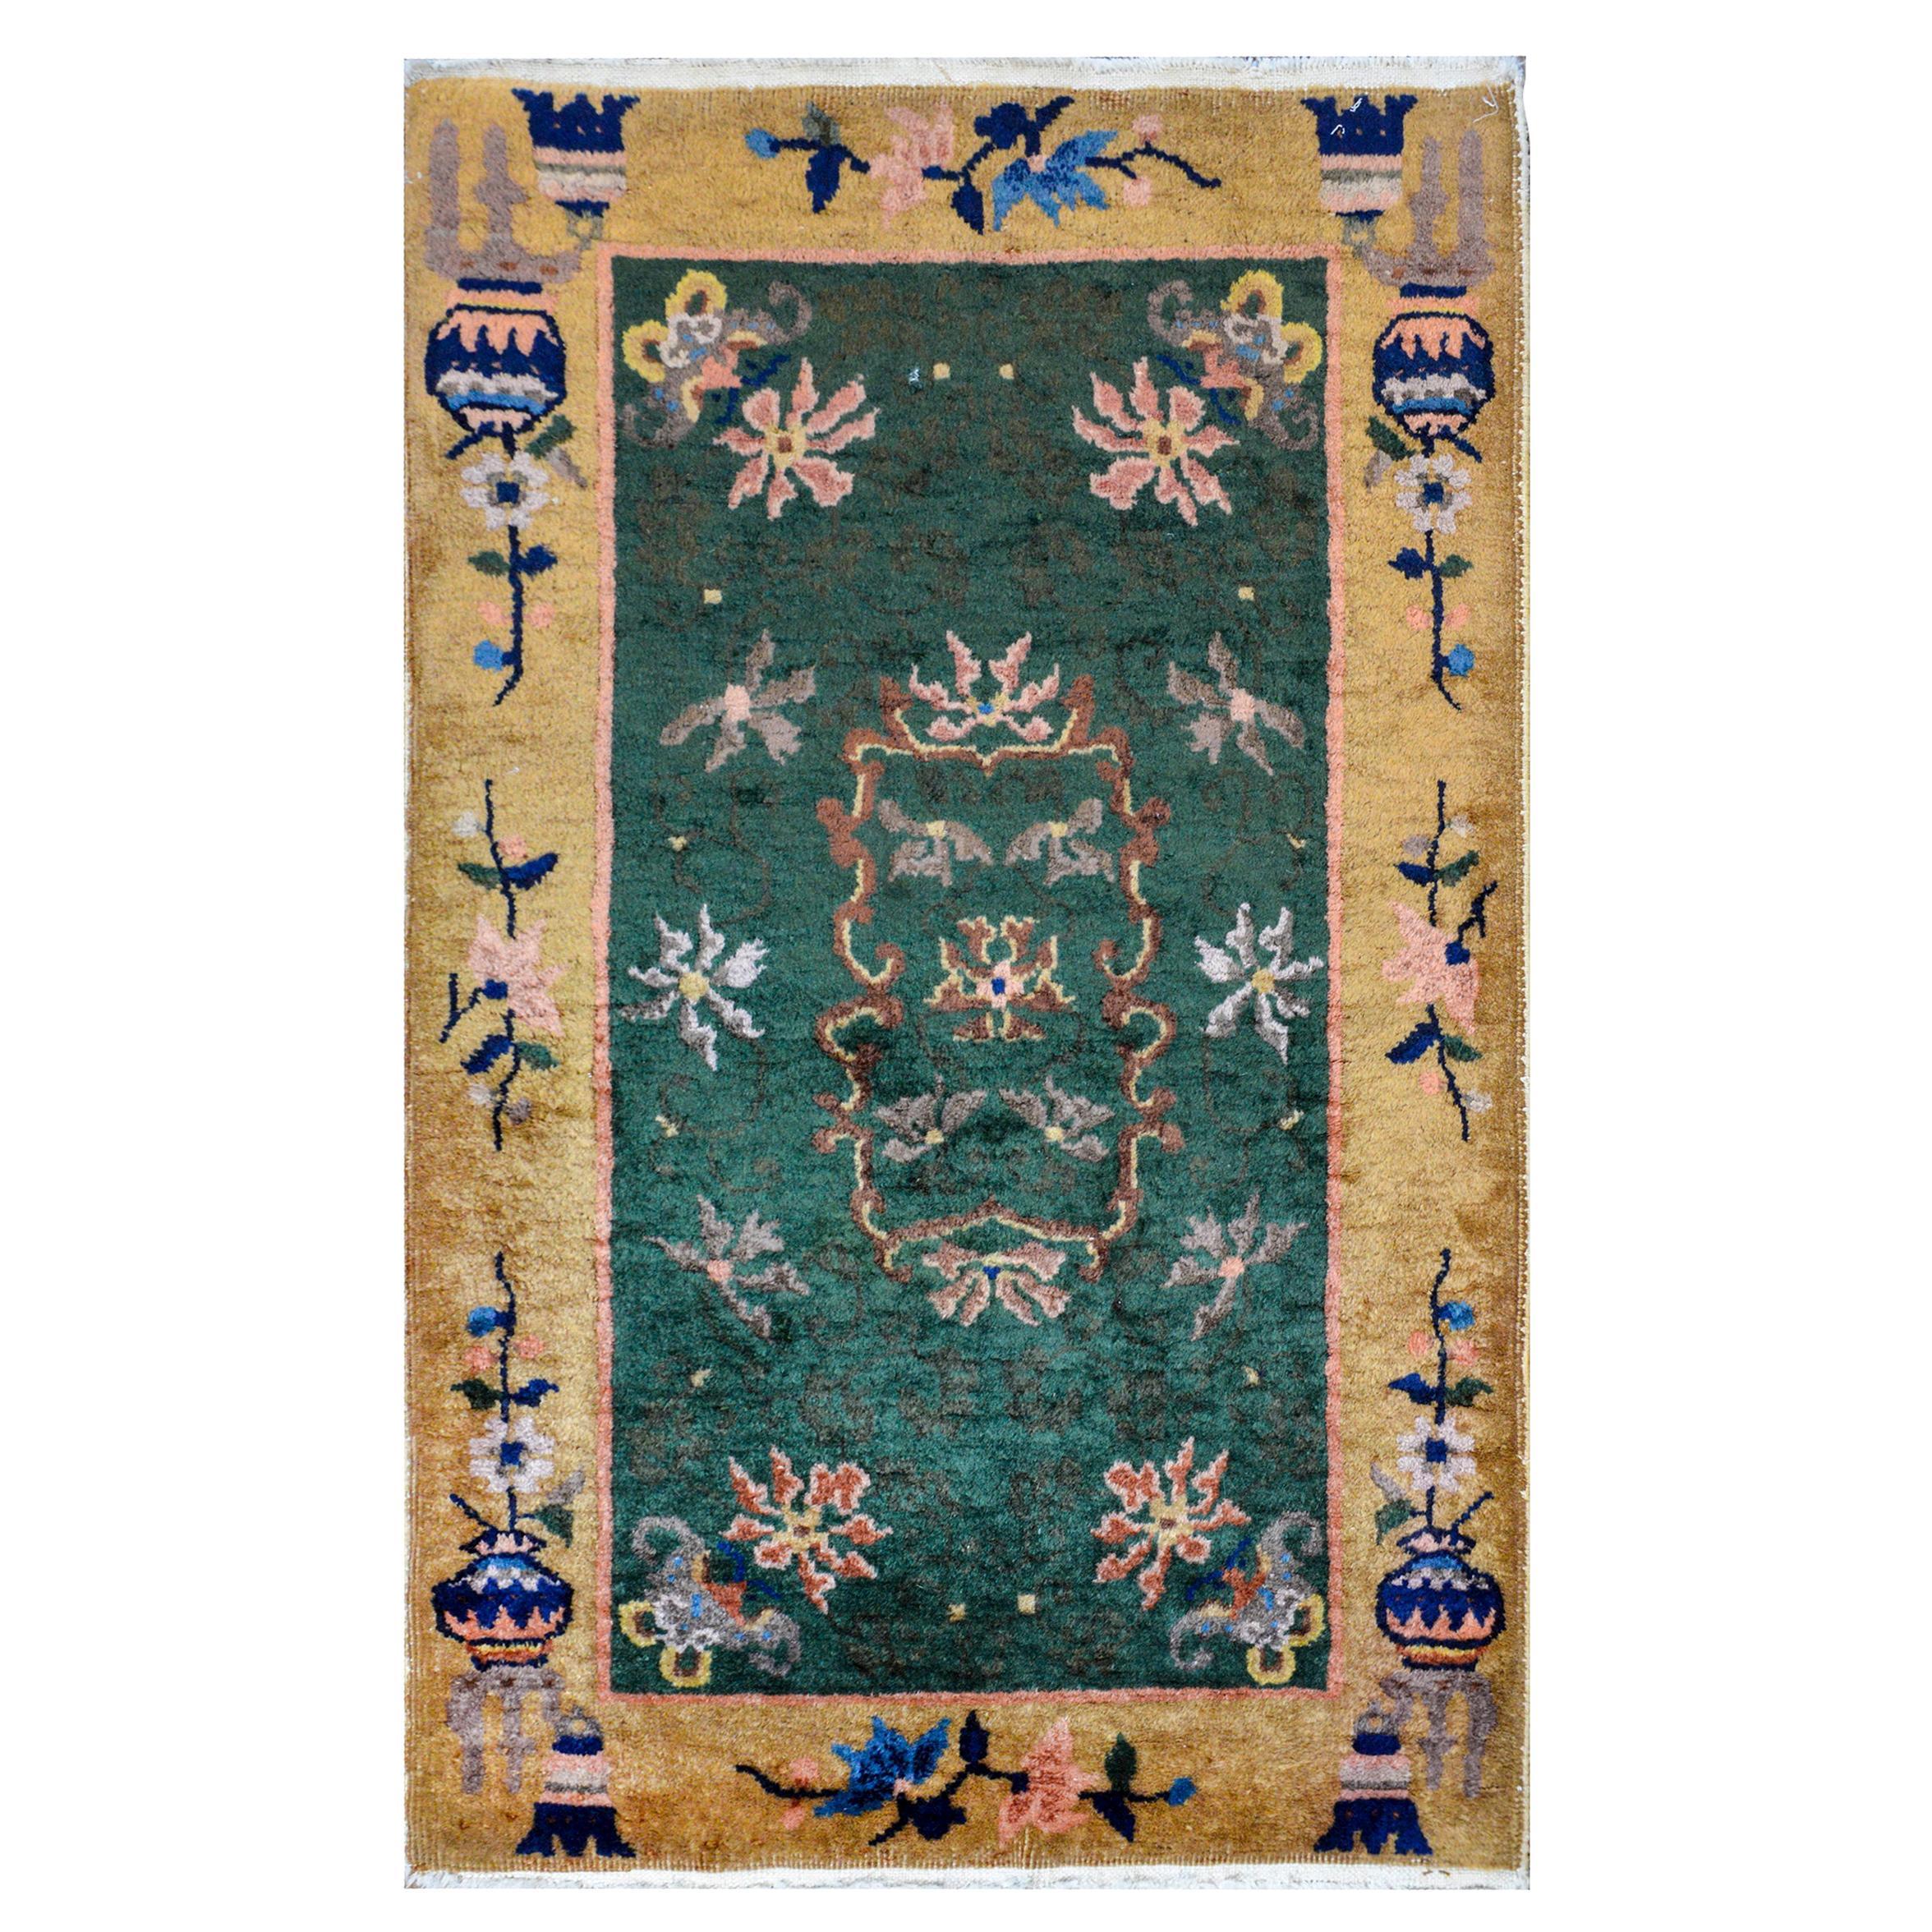 Sweet Chinese Art Deco Rug